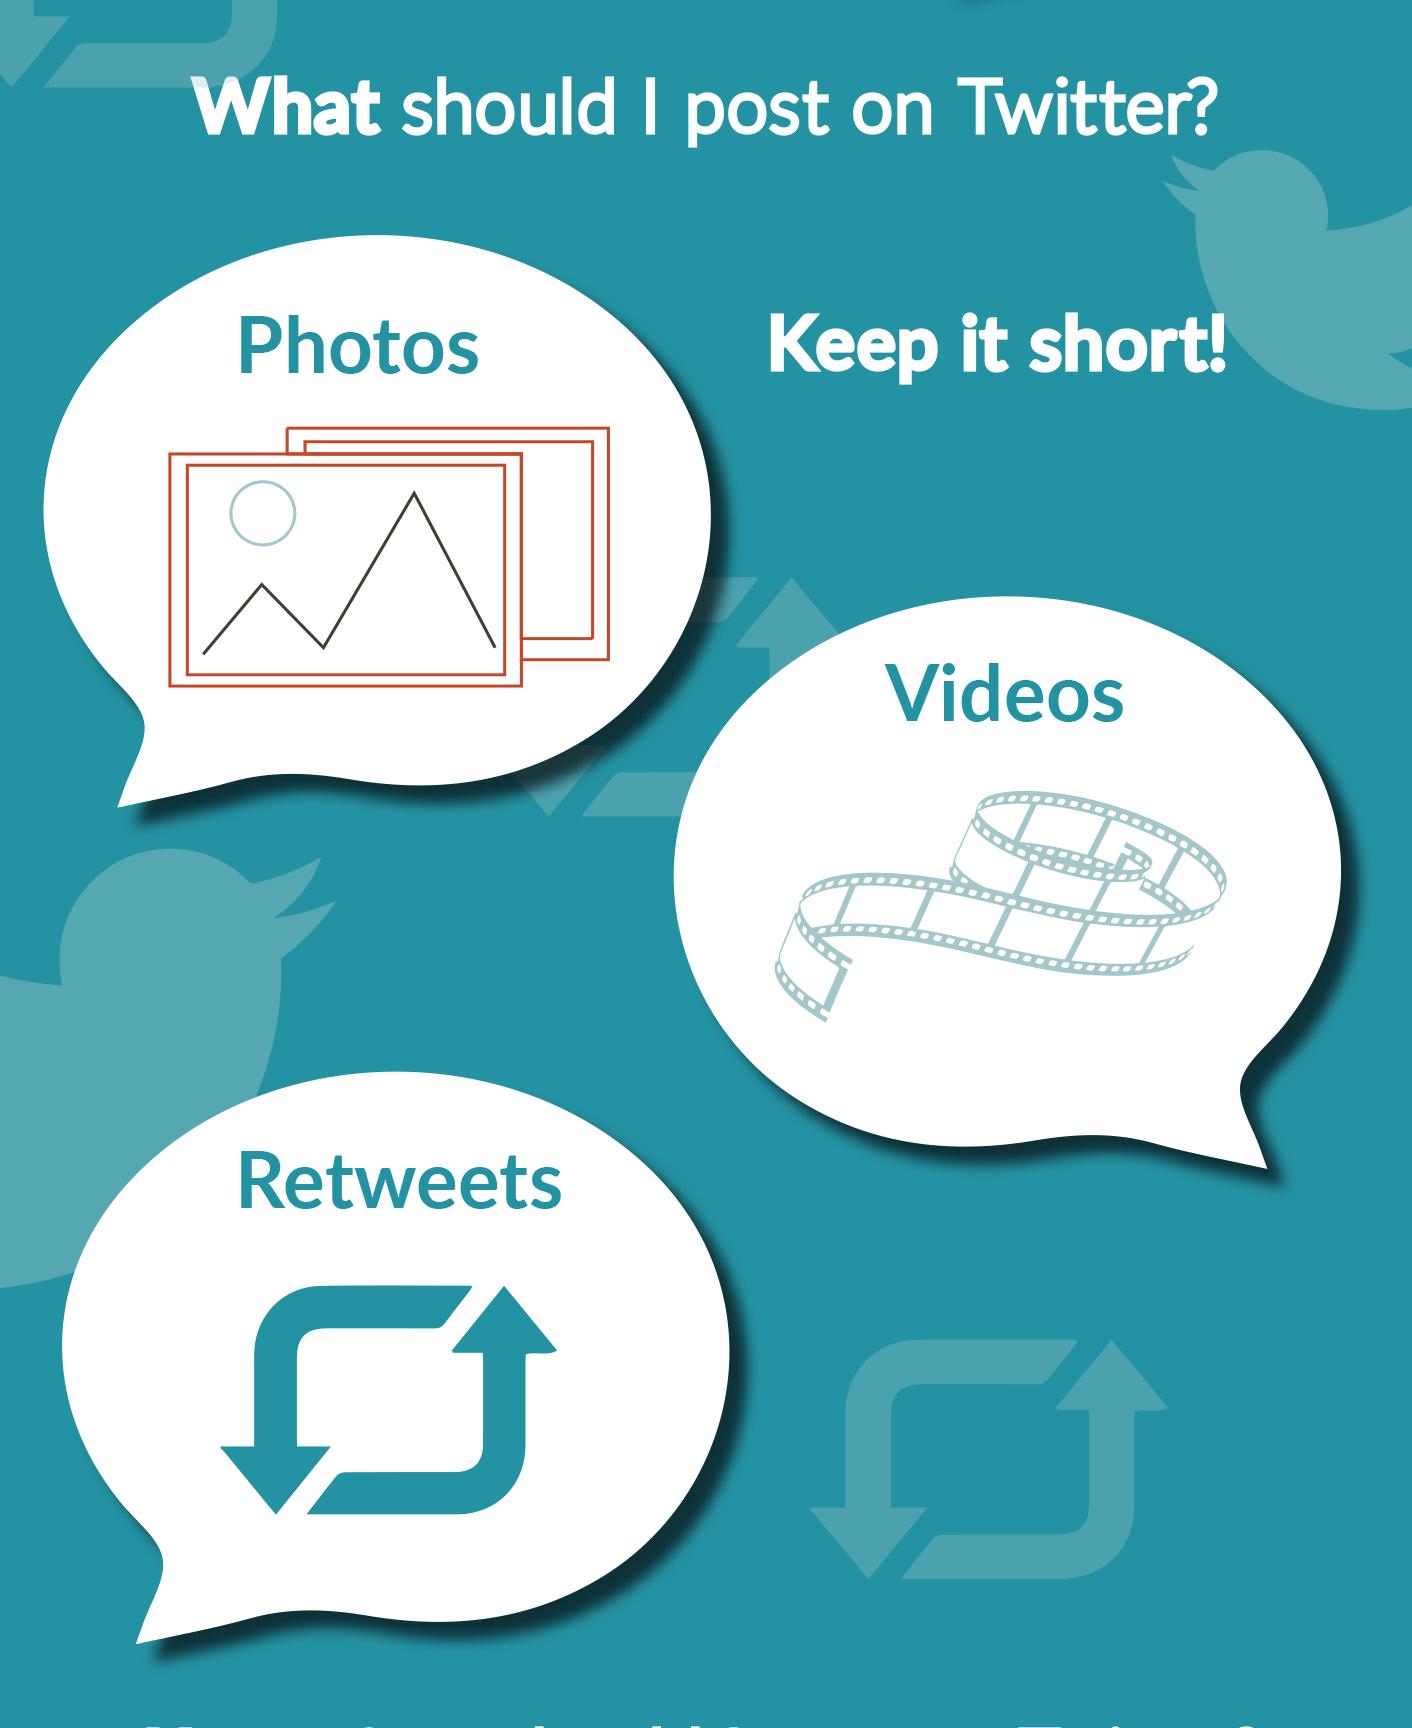 Jones-complete-social-media-guide-twitter_whattopost